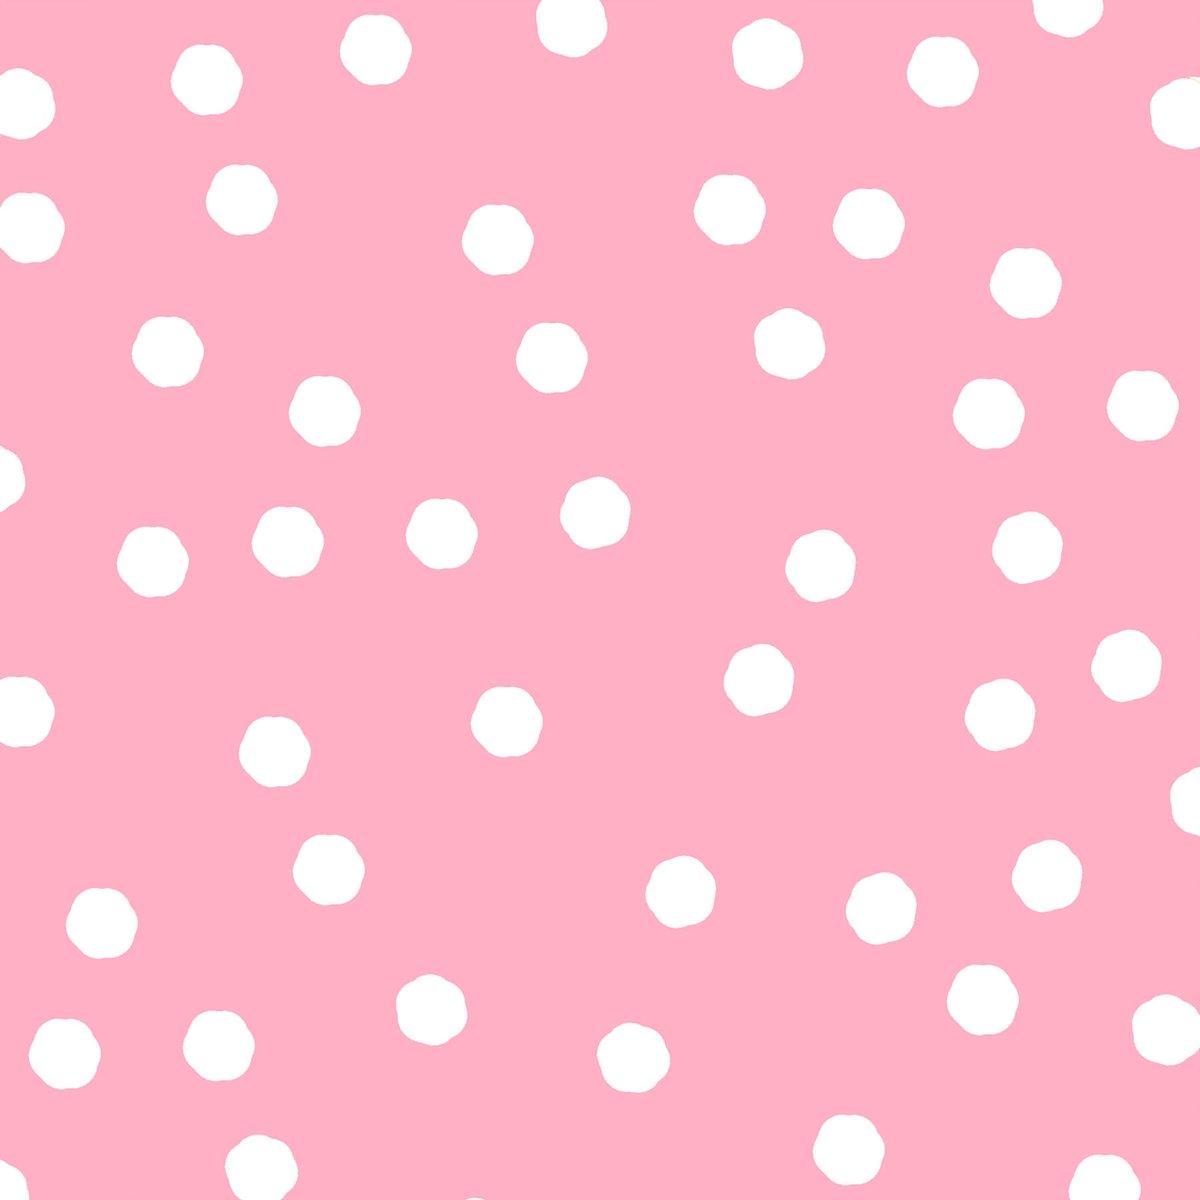 Jumbo Dots Pink / White Fabric Yard